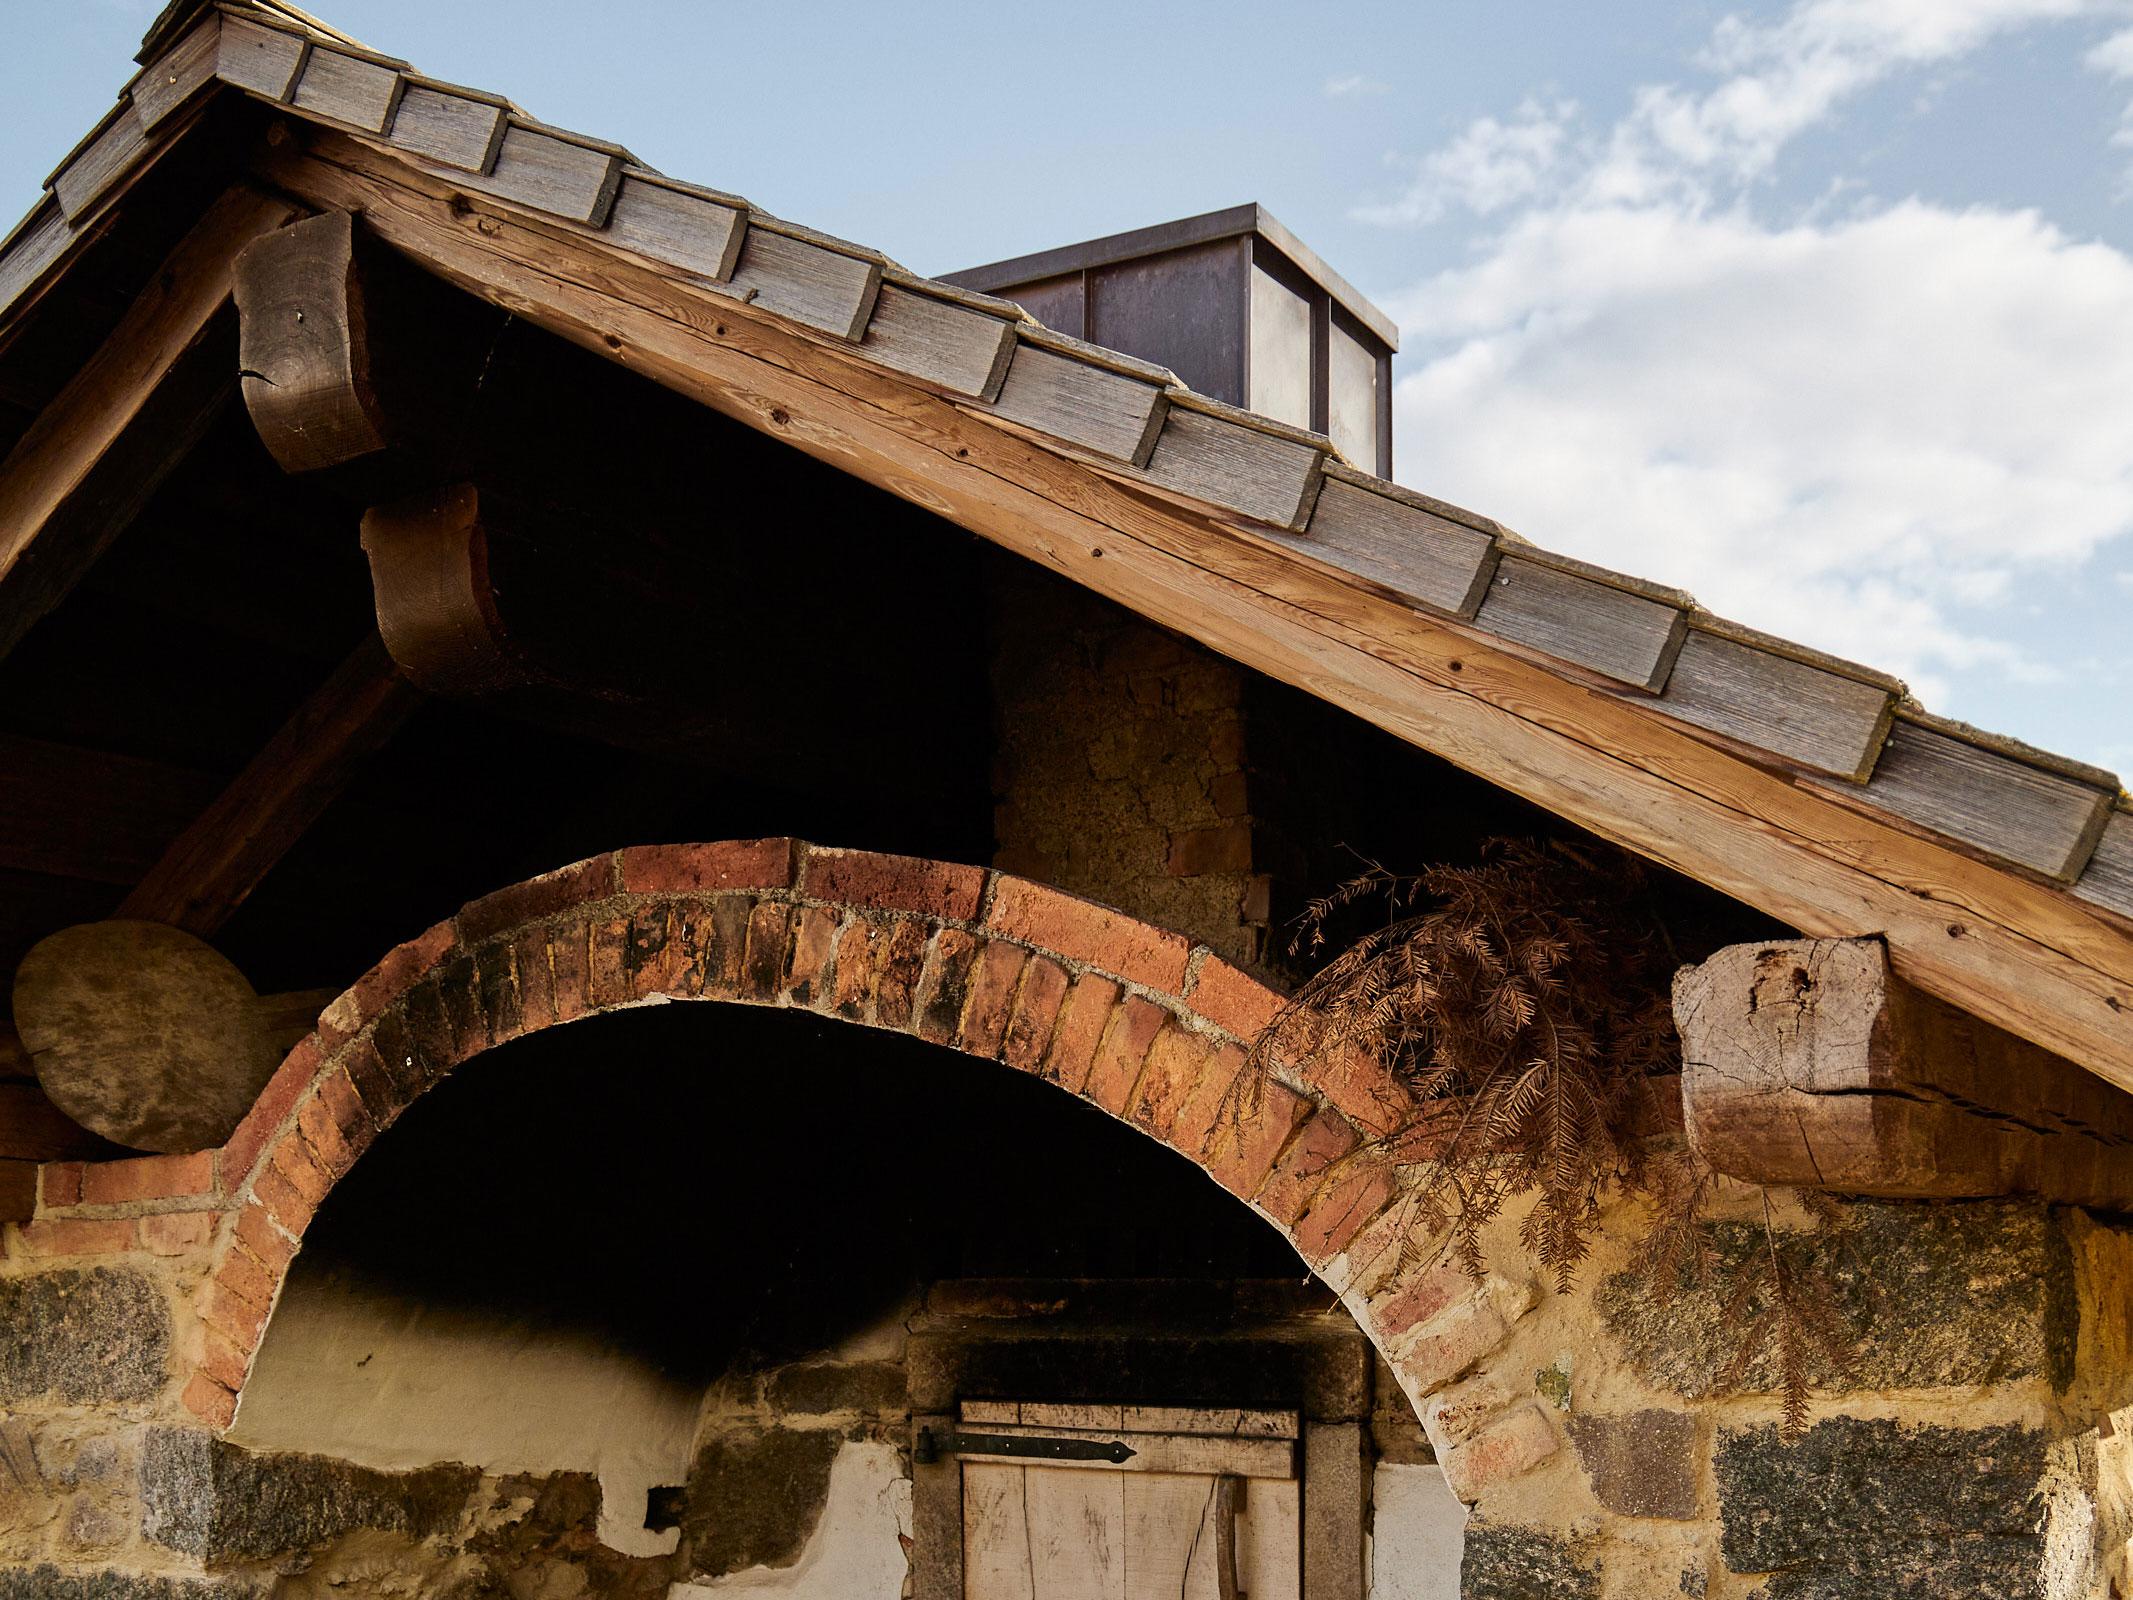 Holzbau Eiler Denkmalpflege